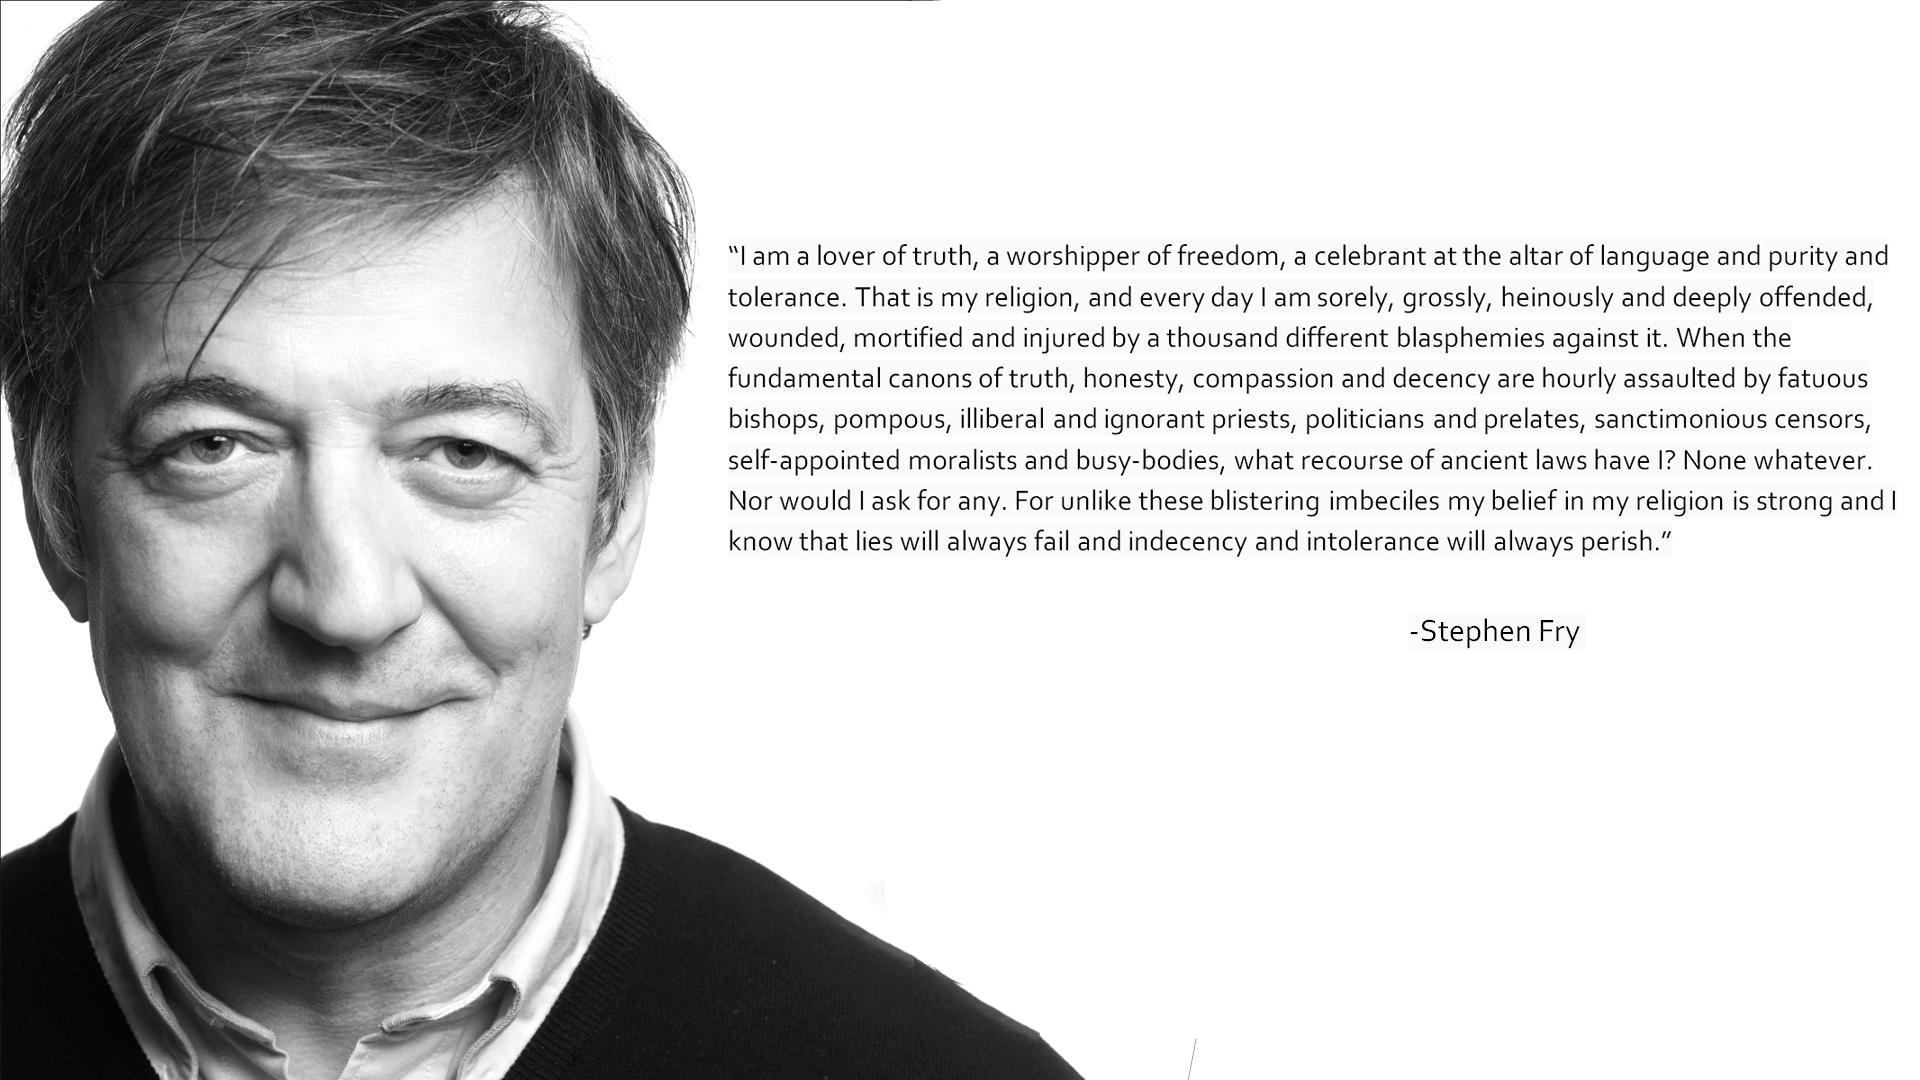 Stephen Fry's quote